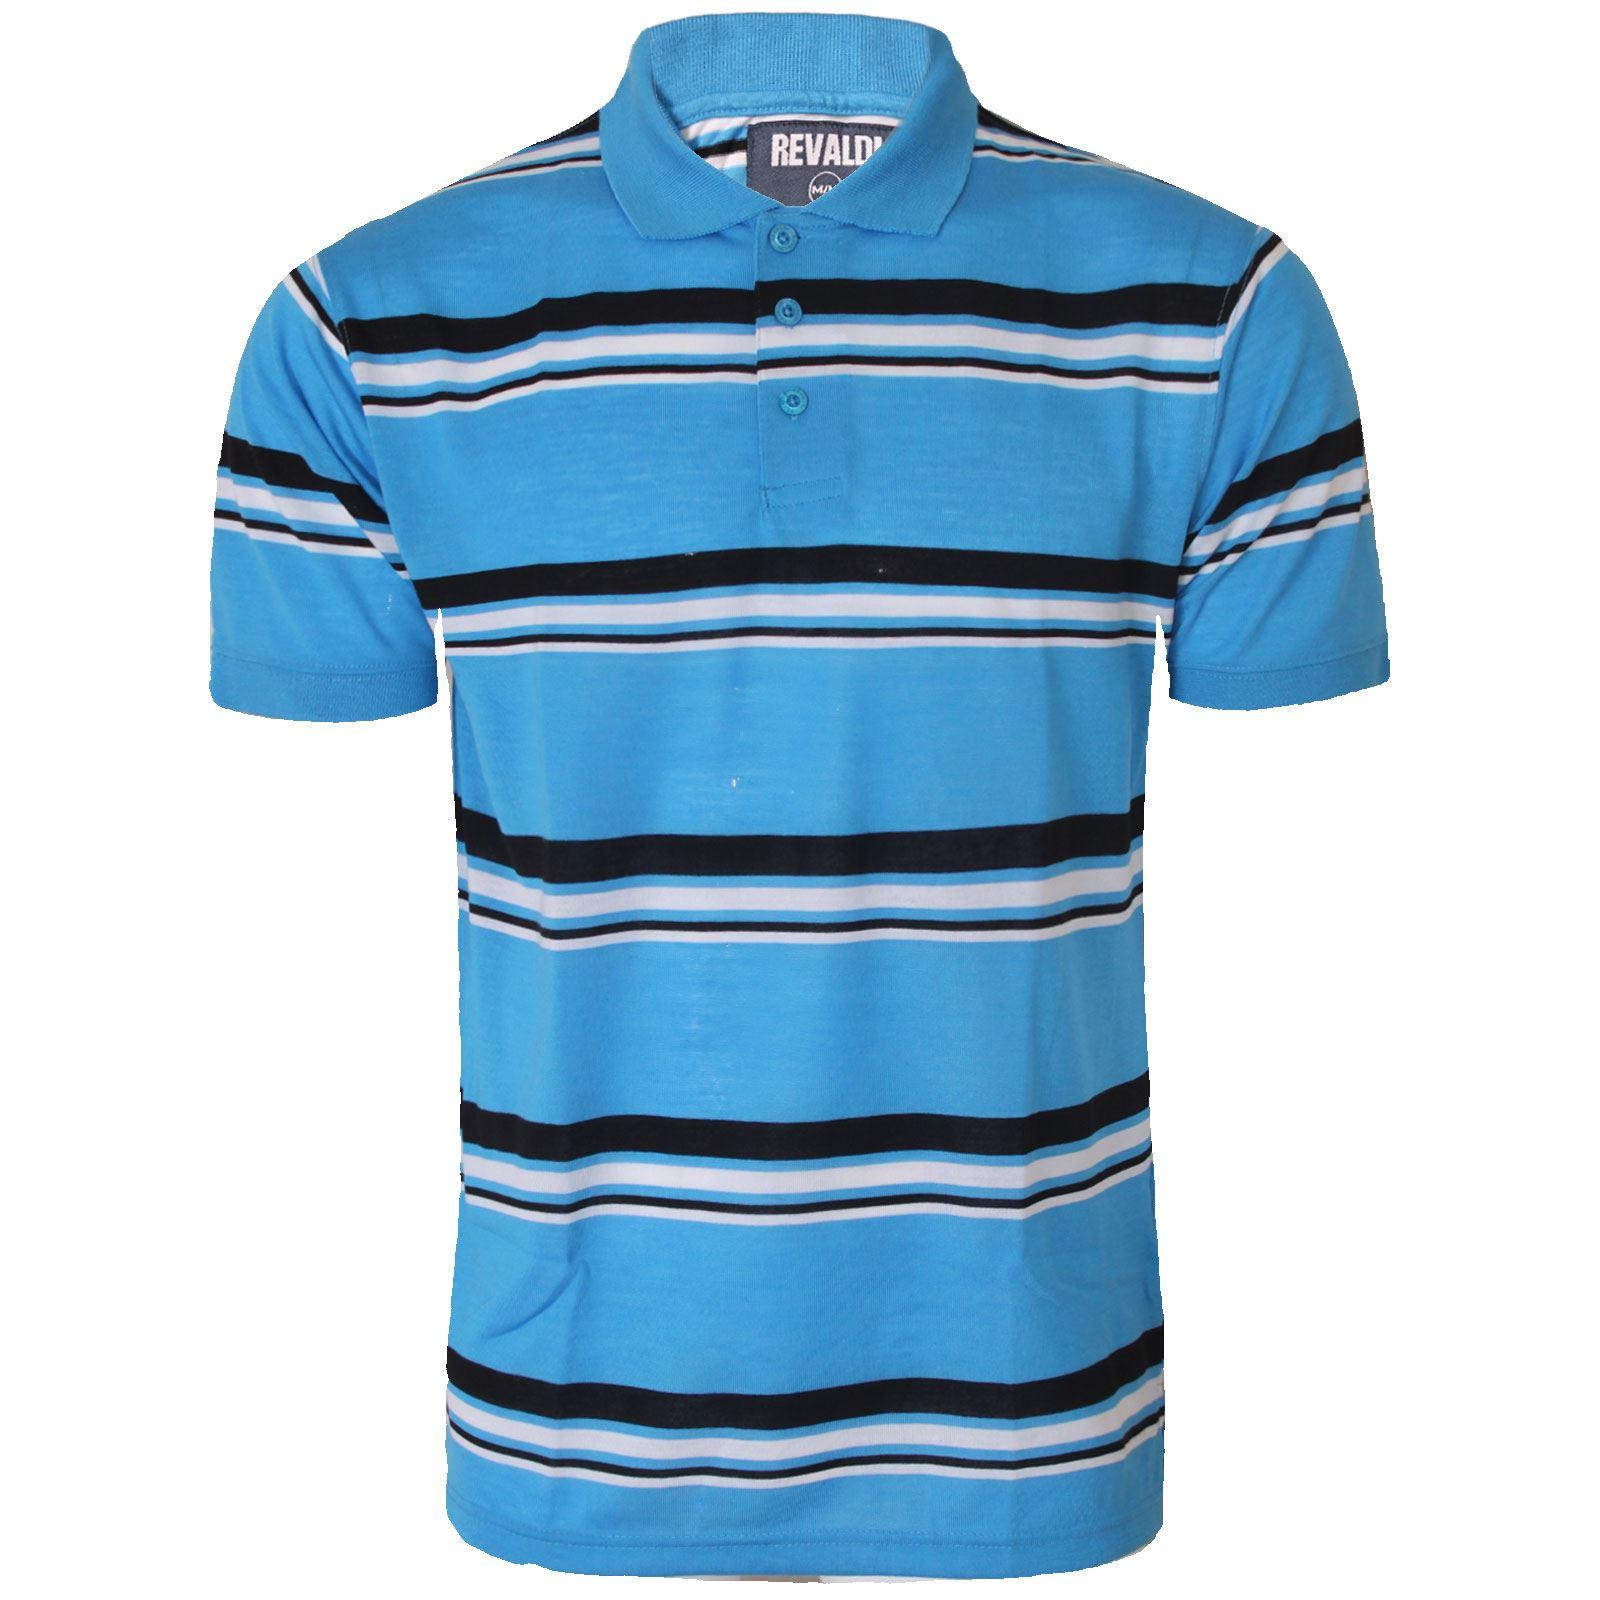 Mens striped short sleeve polo shirt top golf t shirt for Best striped t shirt